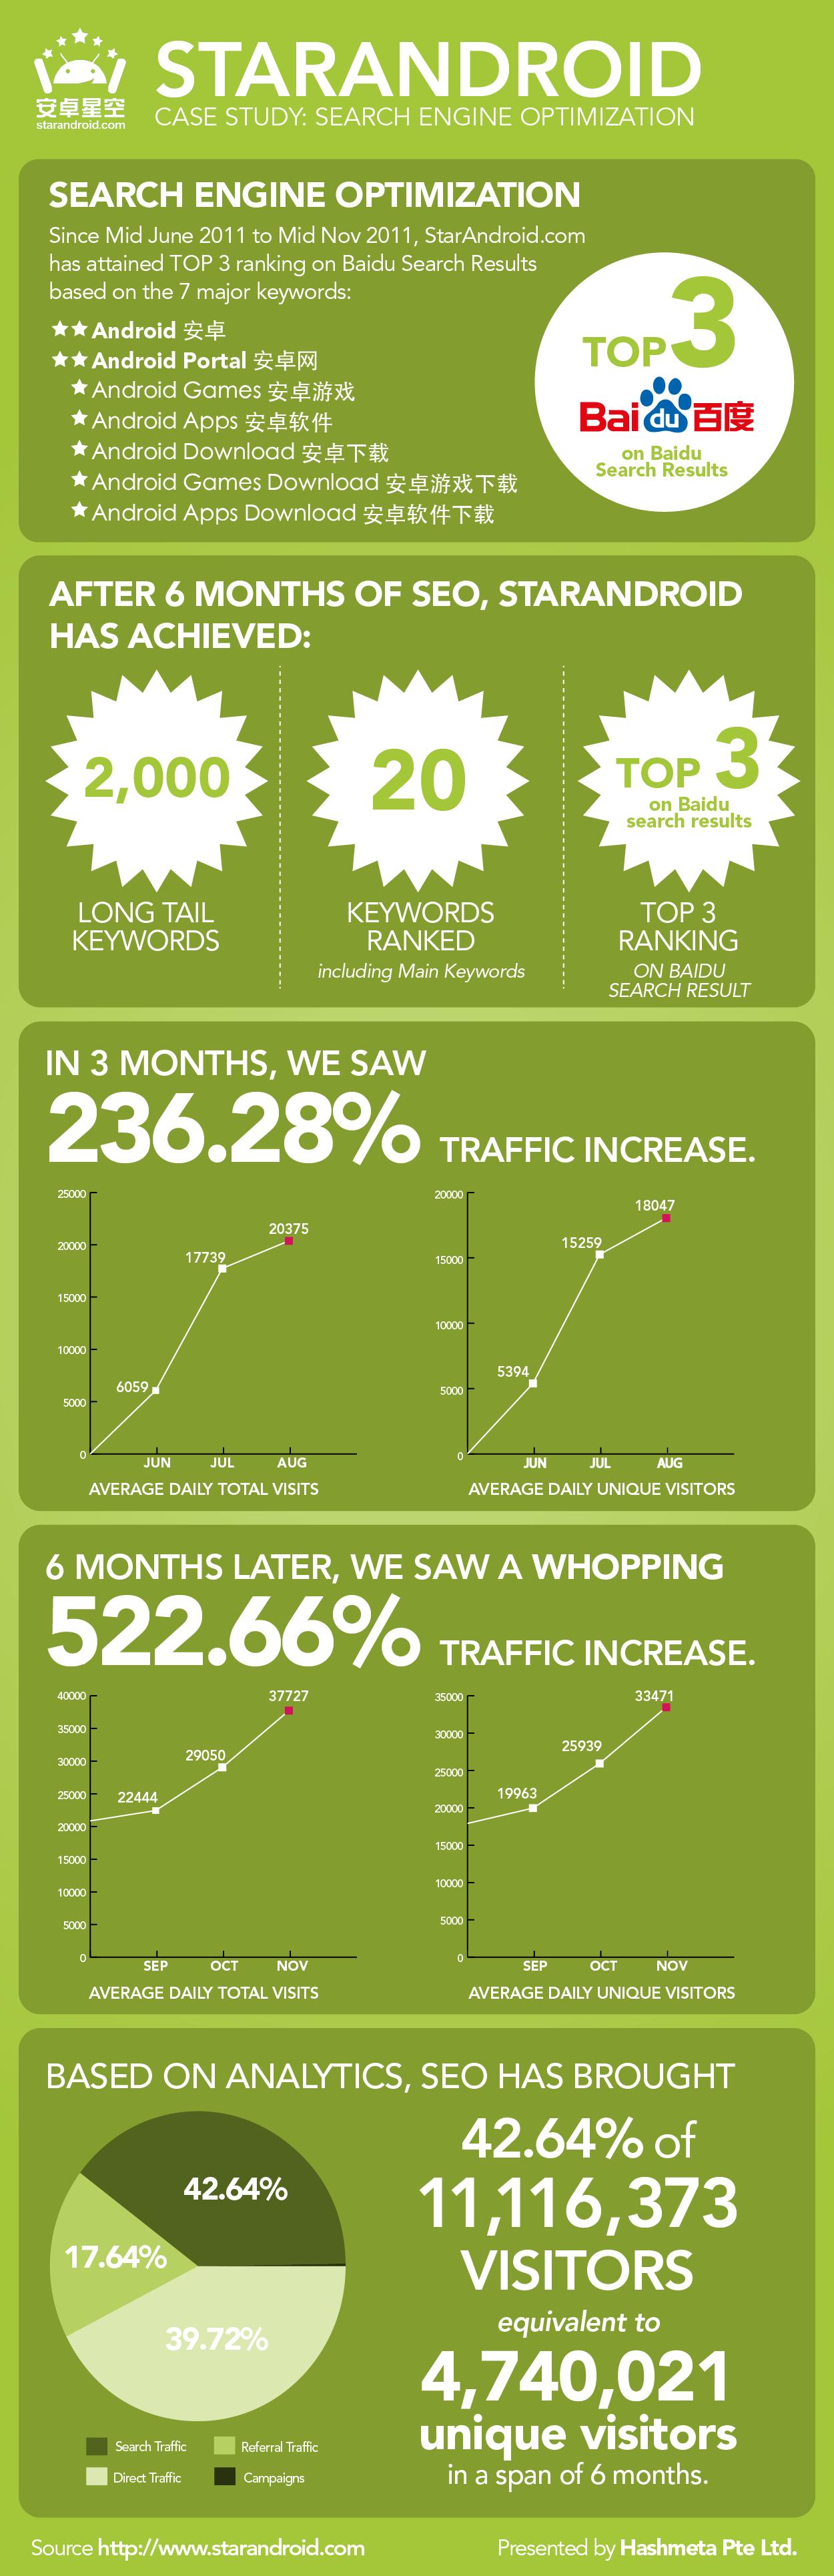 Infographic - Starandroid Marketing Case Study